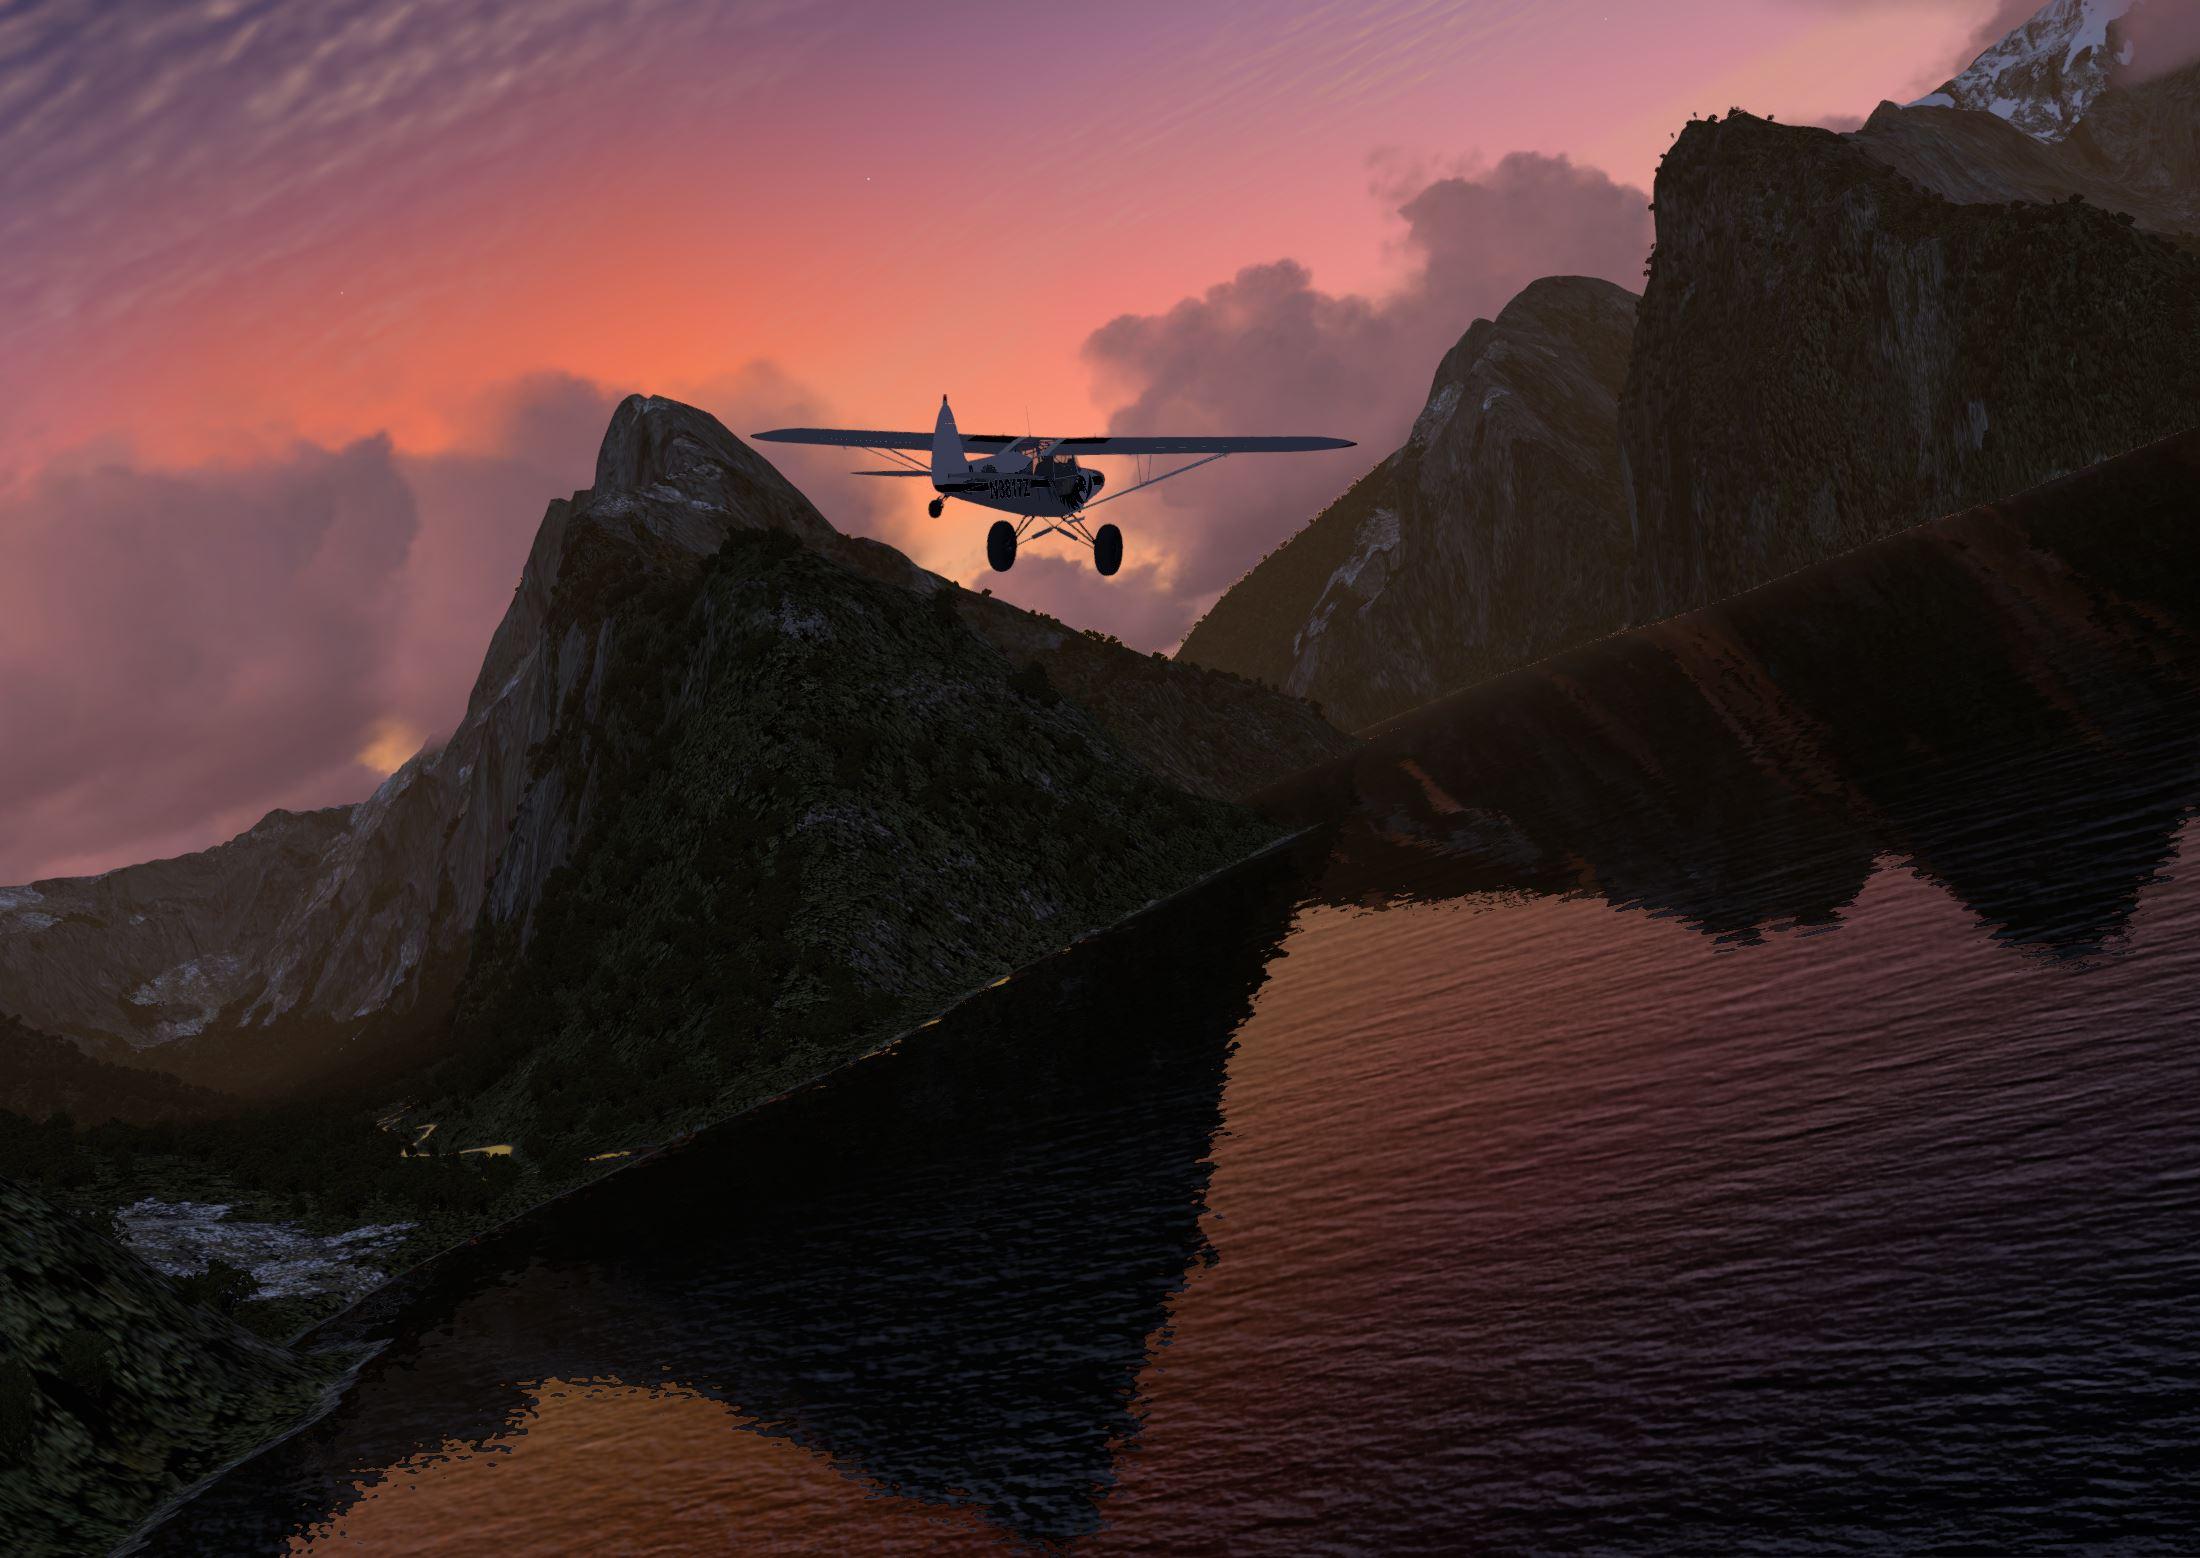 http://www.pilote-virtuel.com/img/gallery/1589746422.jpg